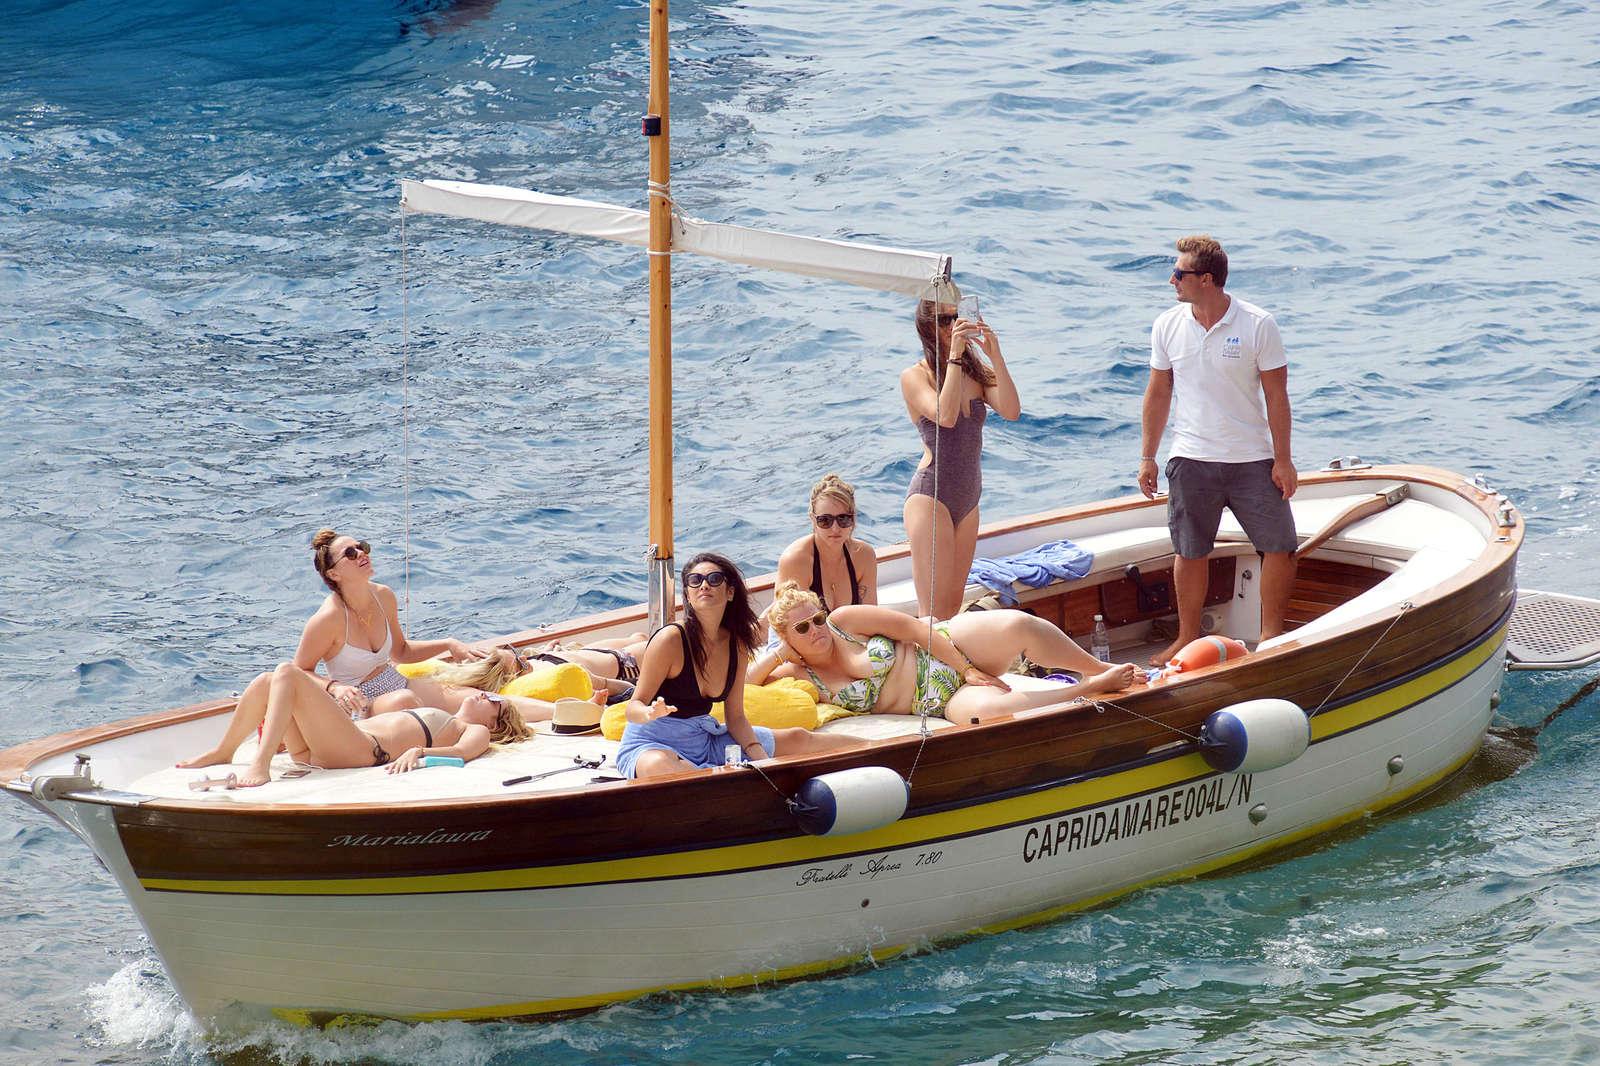 Ashley Benson 2016 : Ashley Benson, Shay Mitchell and Troian Bellisario on a boat in Capri -06